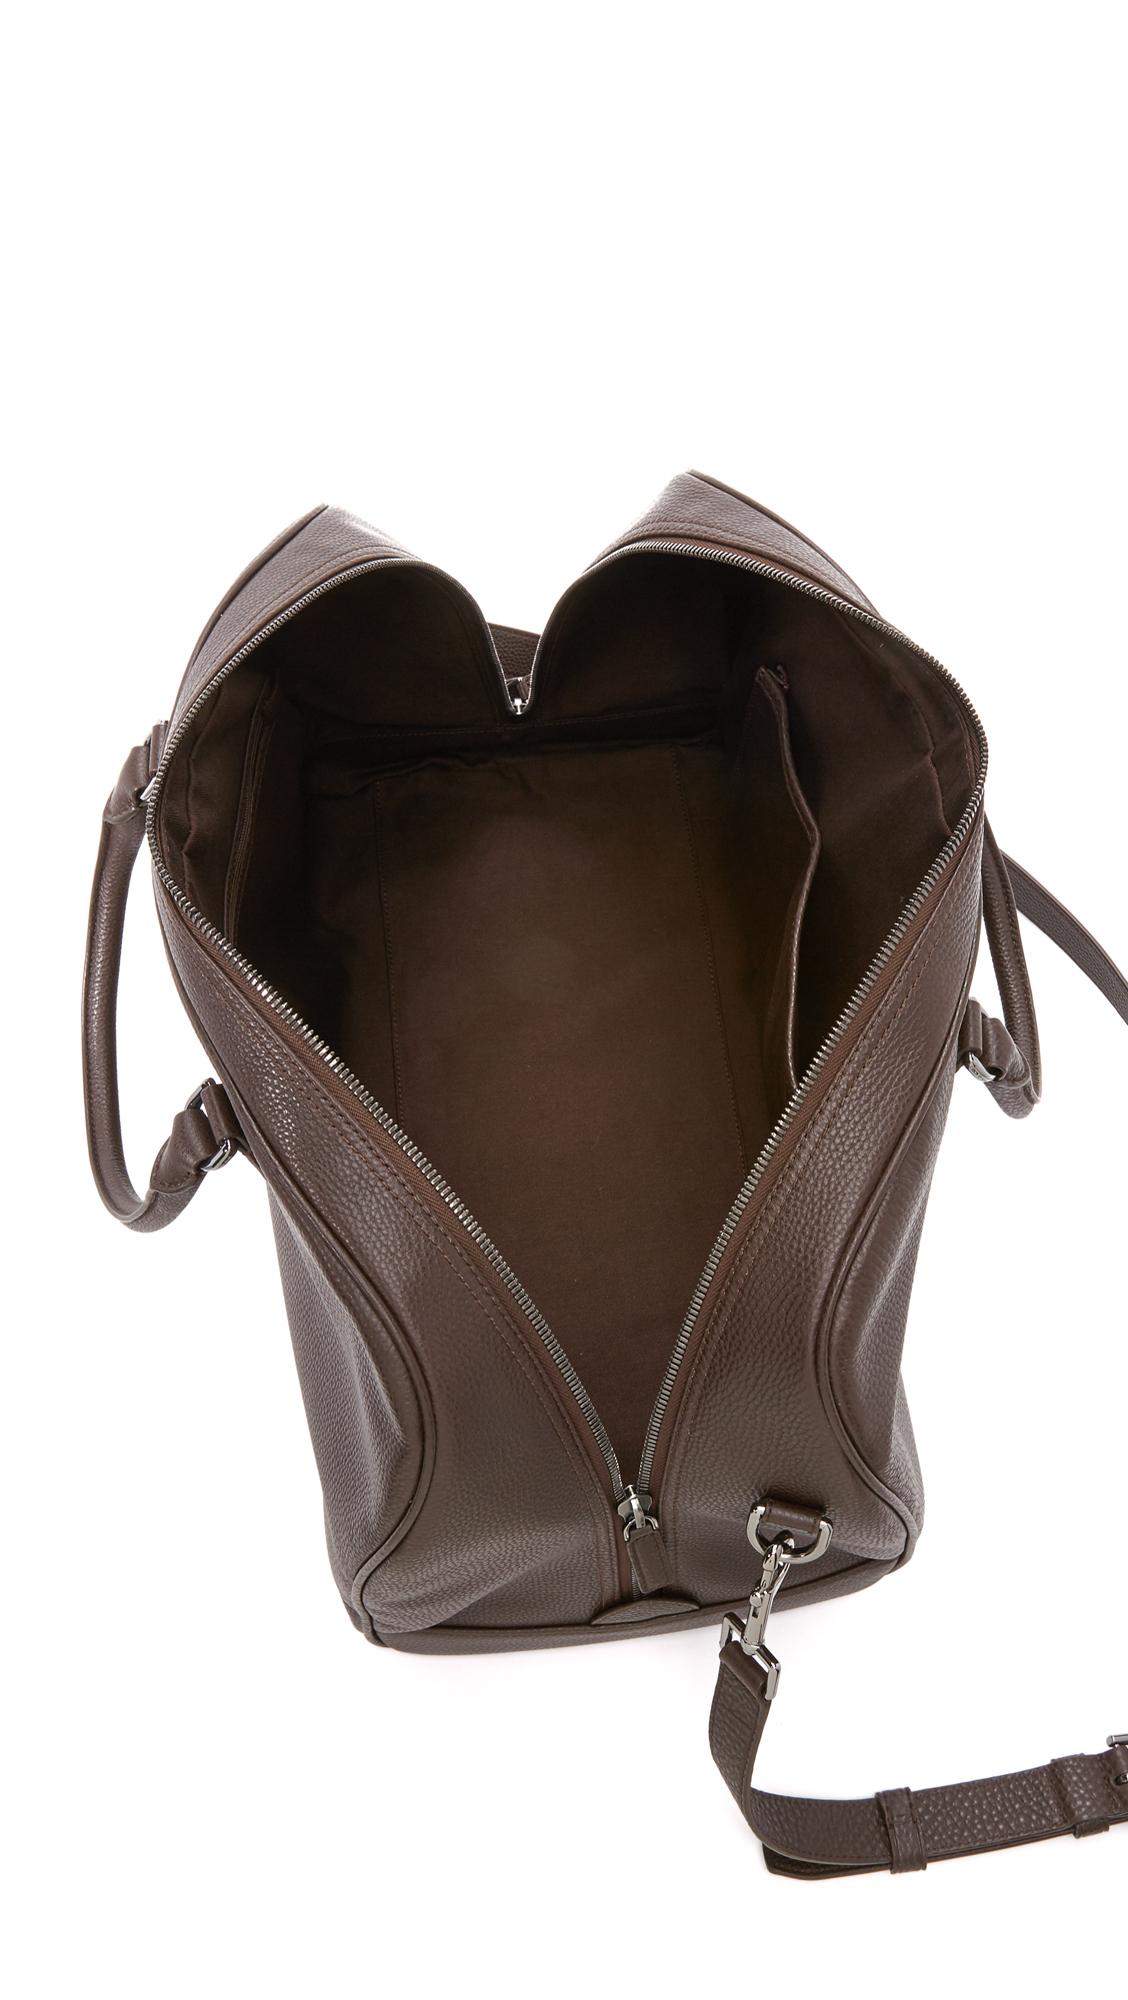 Michael Kors Bryant Pebbled Leather Large Duffel Bag In